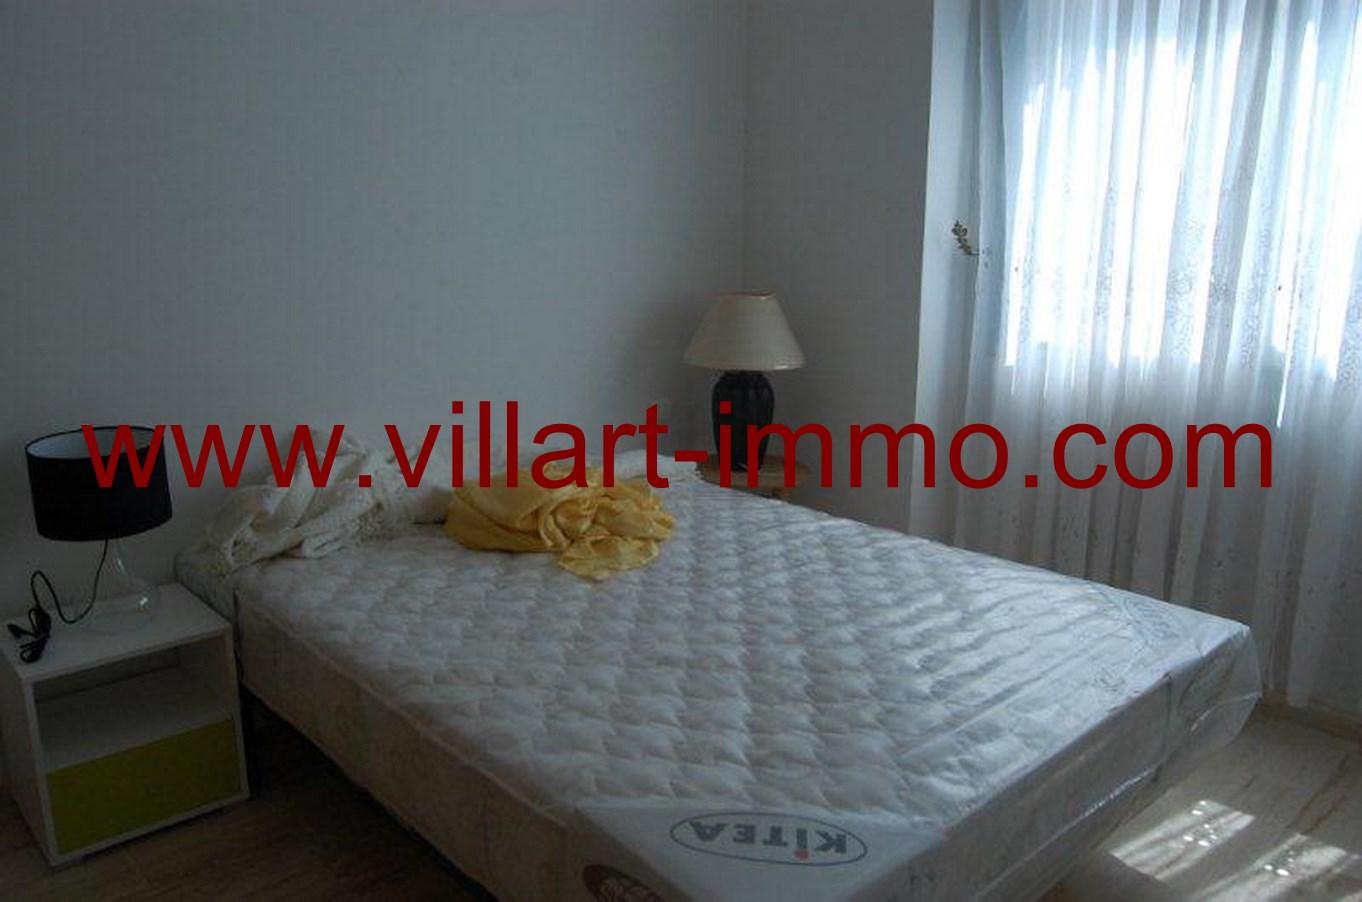 5-Location-Appartement-meublé-Tanger-chambre 1-L678-Villart-immo